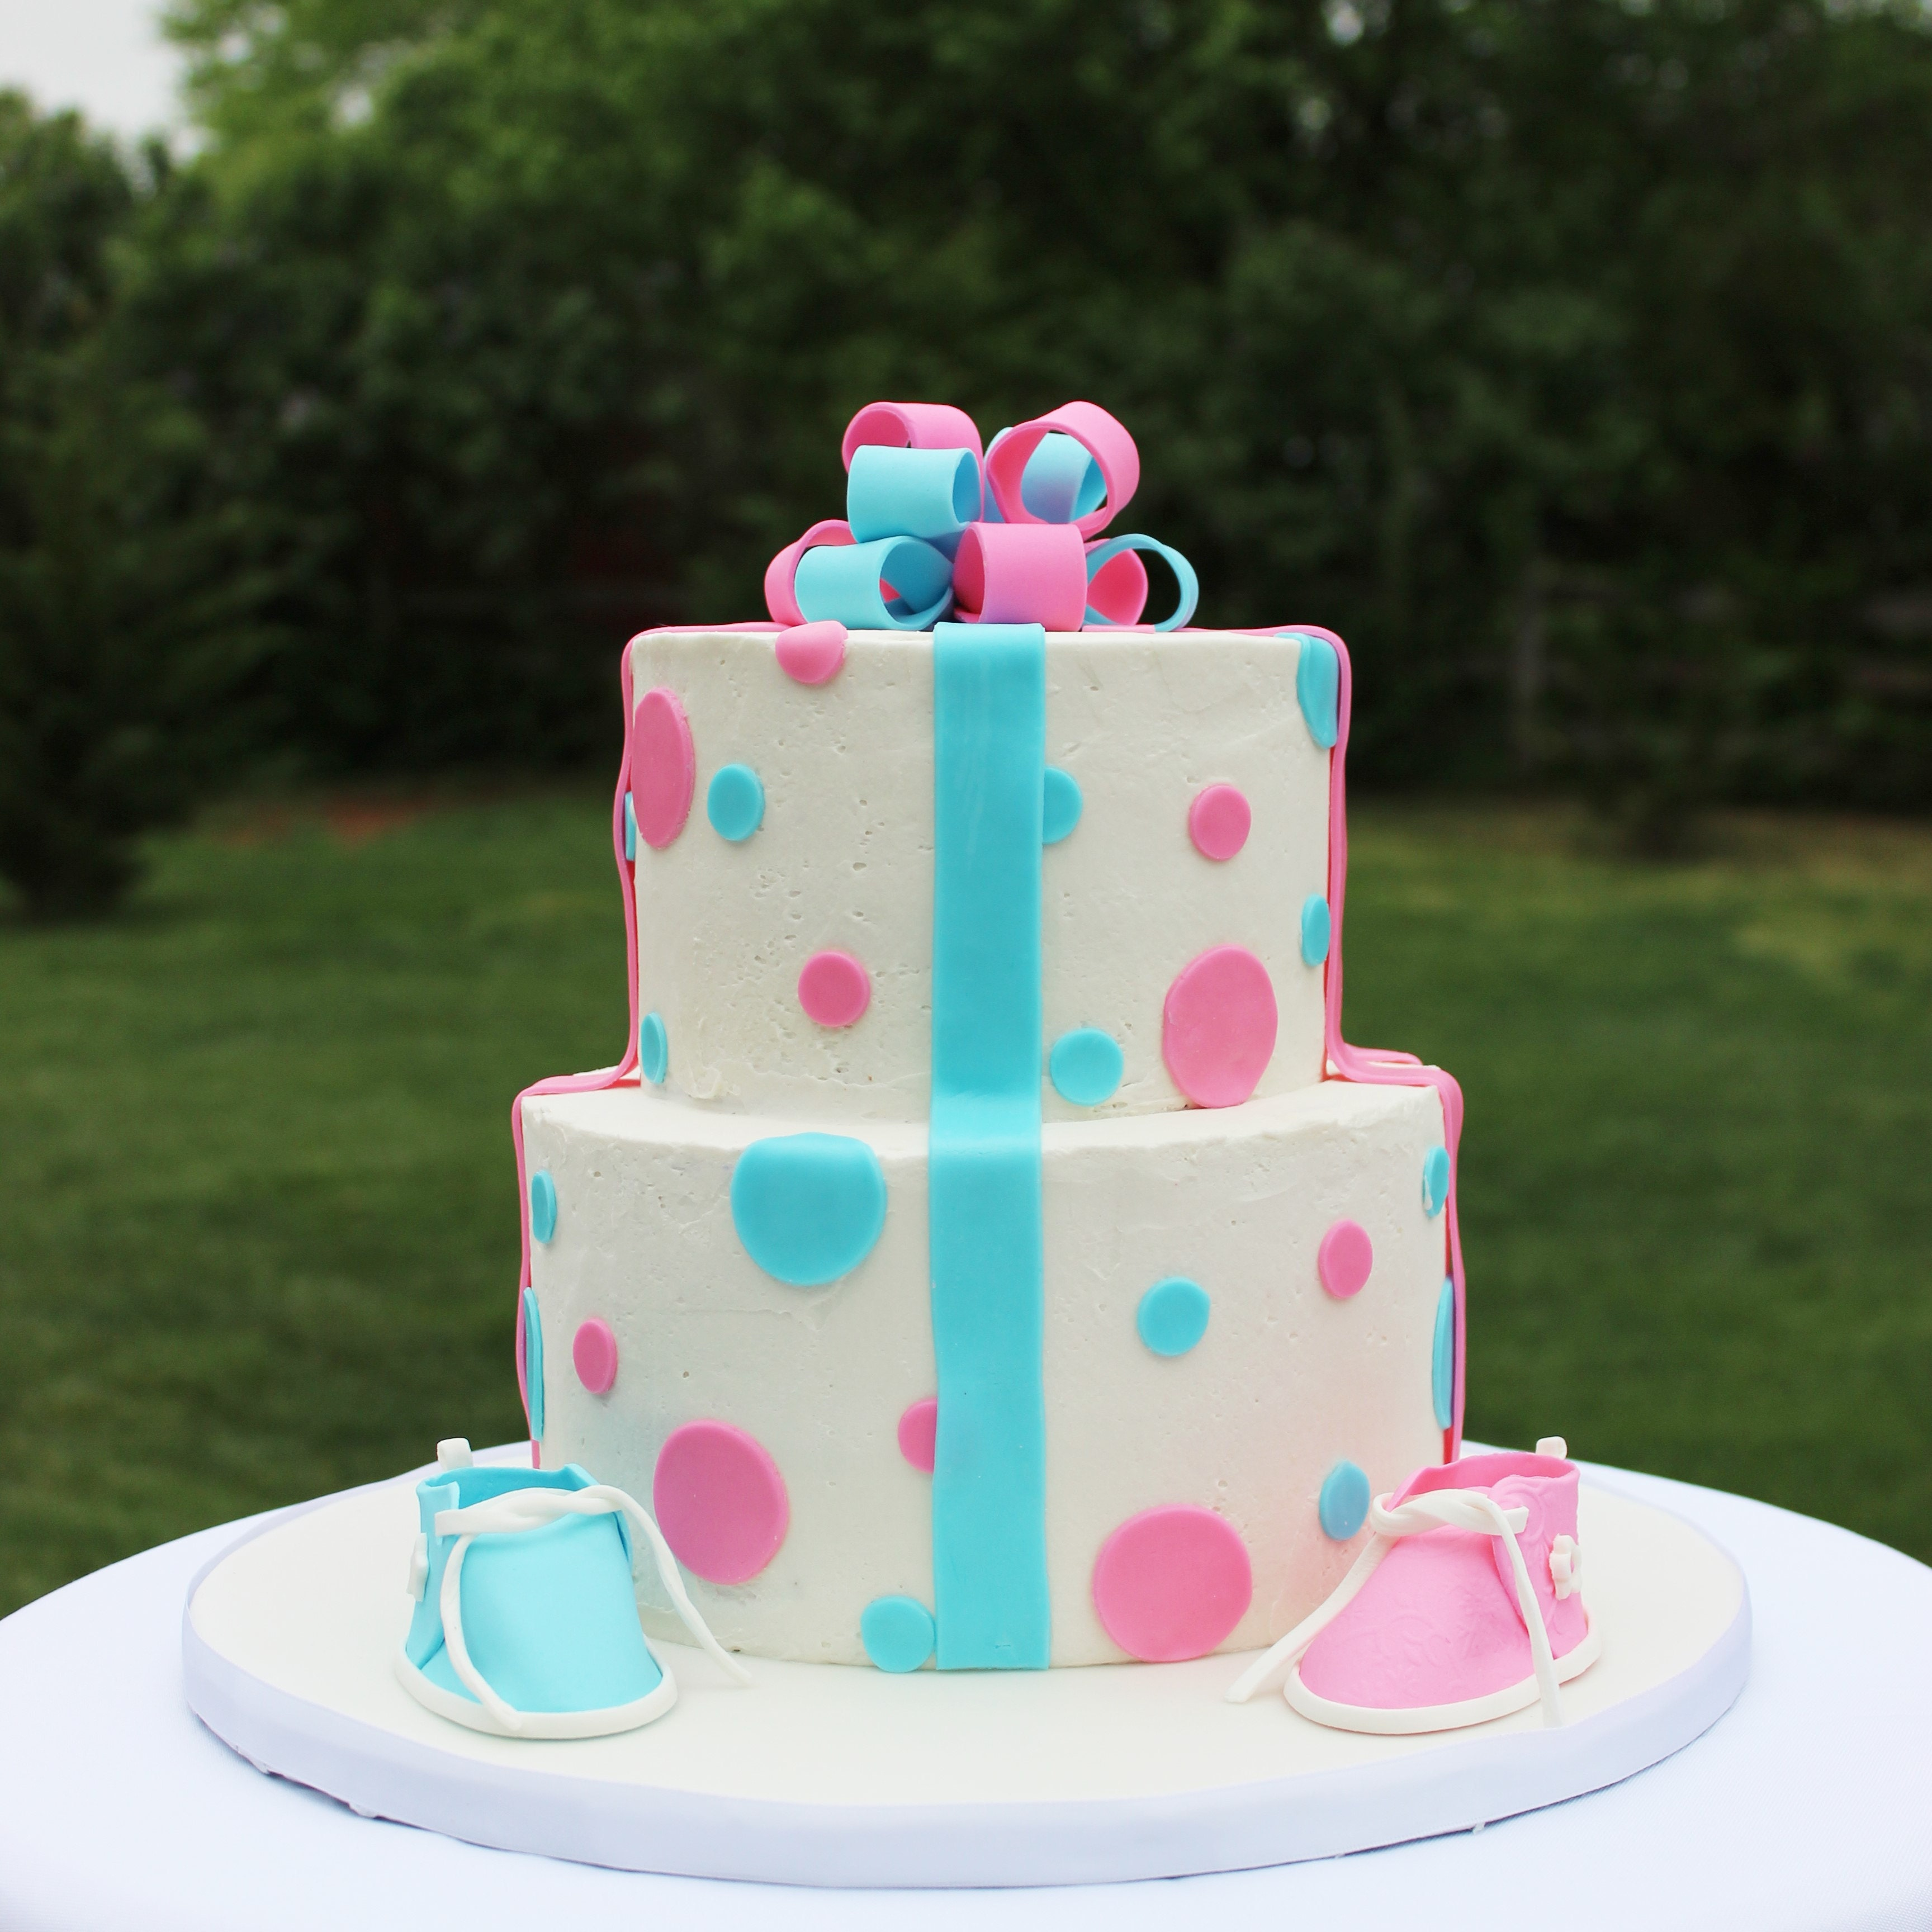 Unicorn Cake Topper Birthday Cake Unicorn Cake DIY Birthday